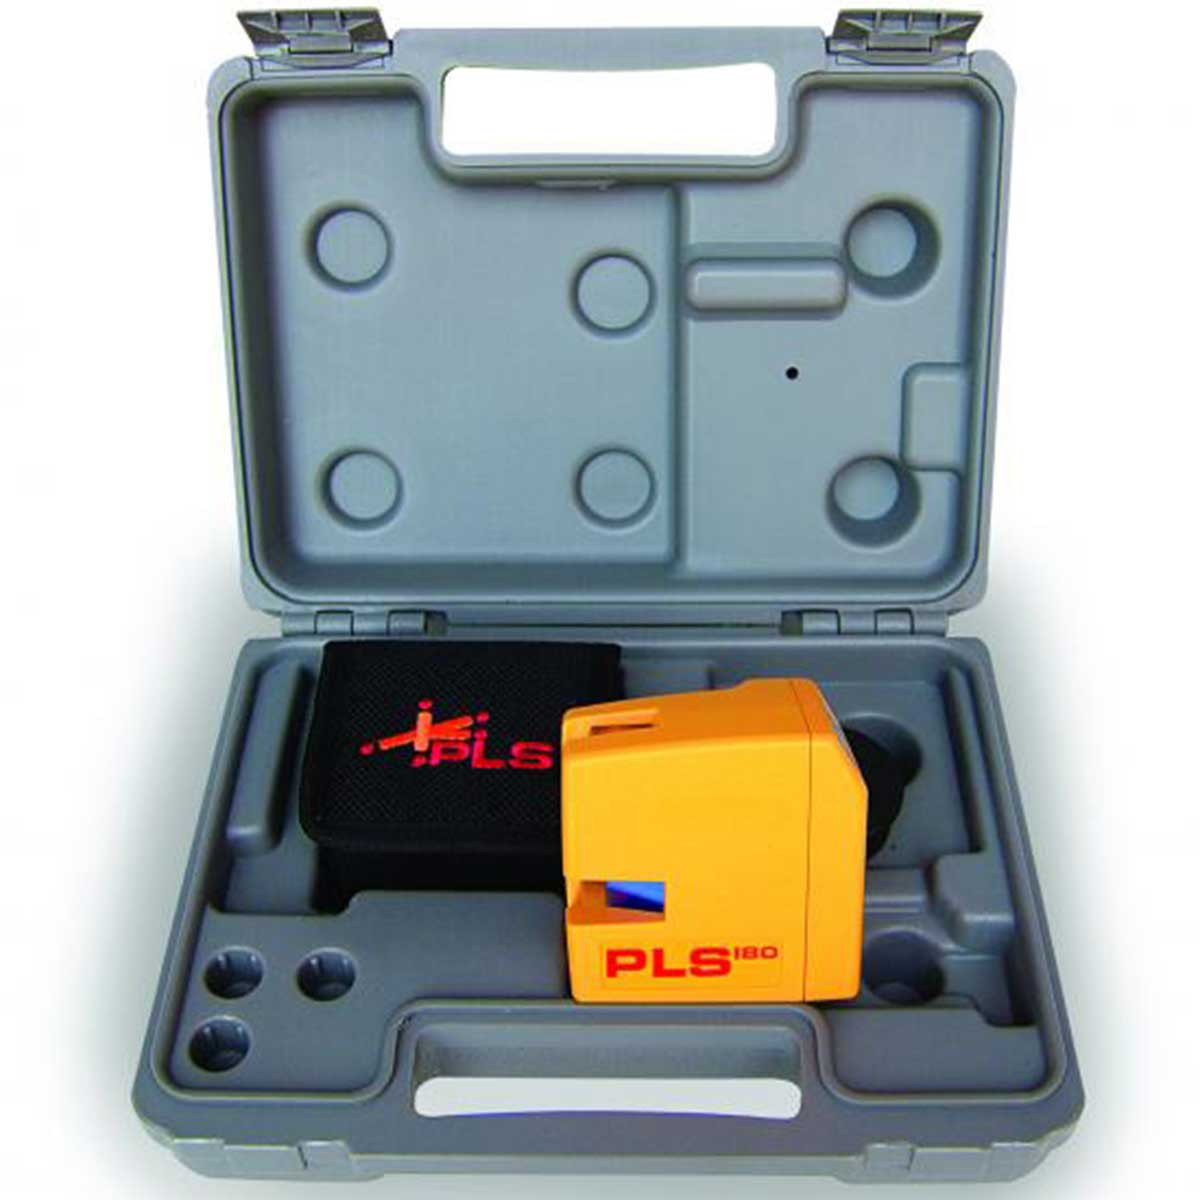 PLS180 Pacific Laser Level Tool Kit